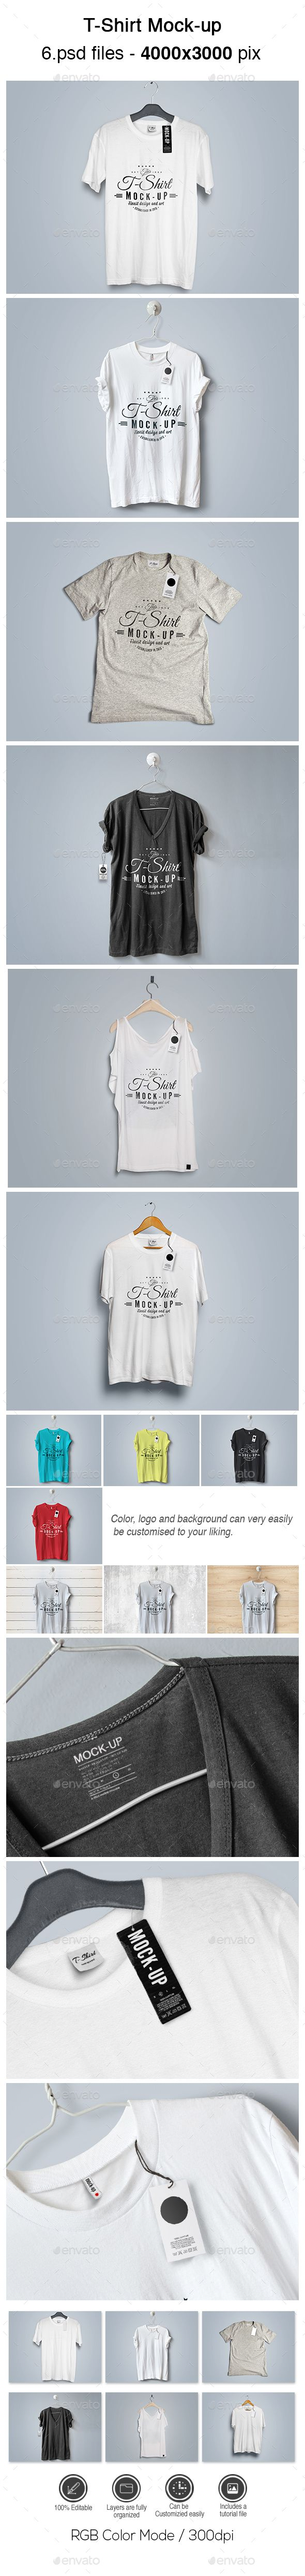 T-shirt design kit free download full - T Shirt Mock Up